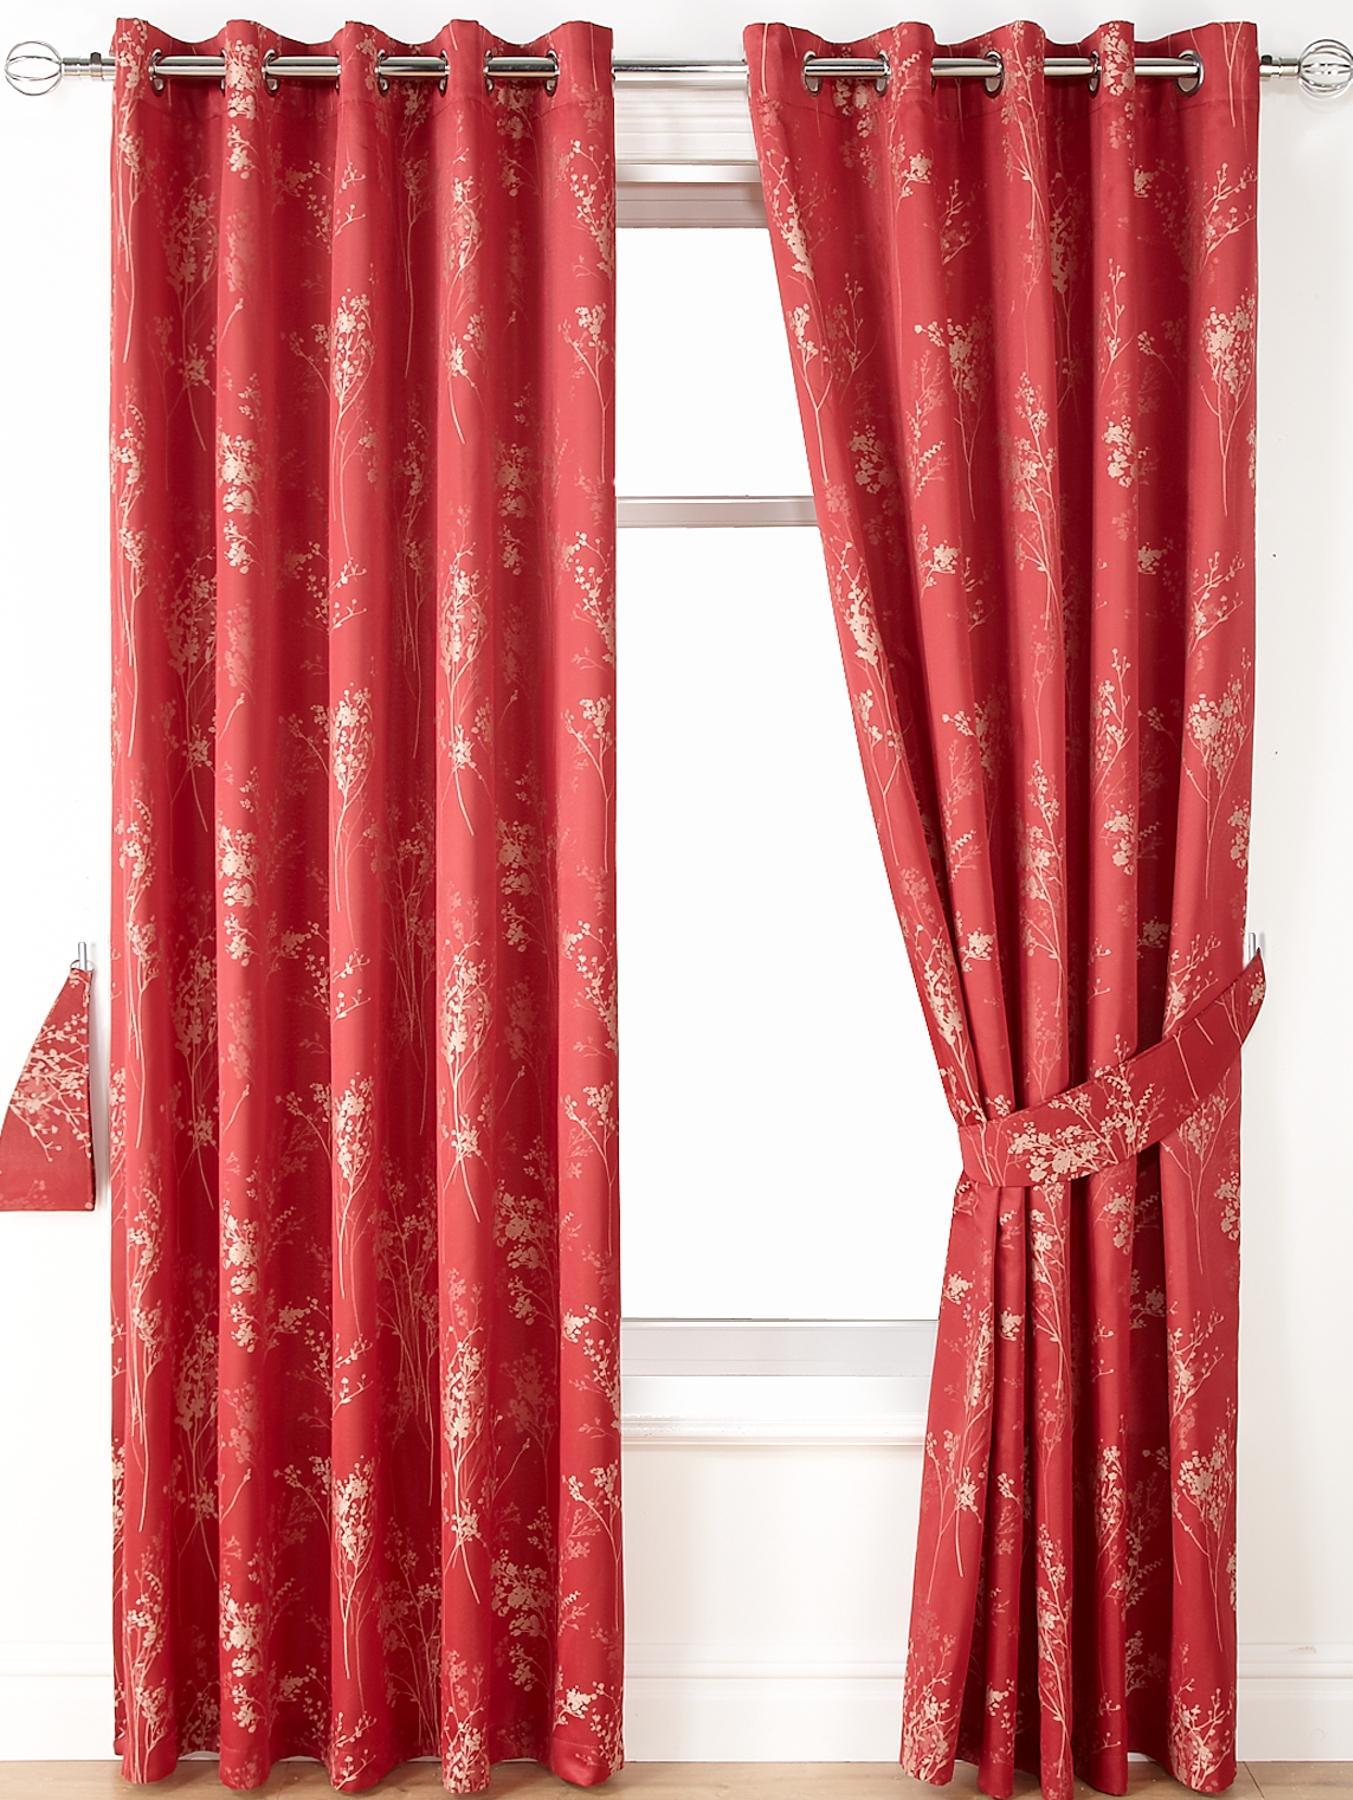 Tokyo Jacquard Blackout Eyelet Curtains, Red,Silver.